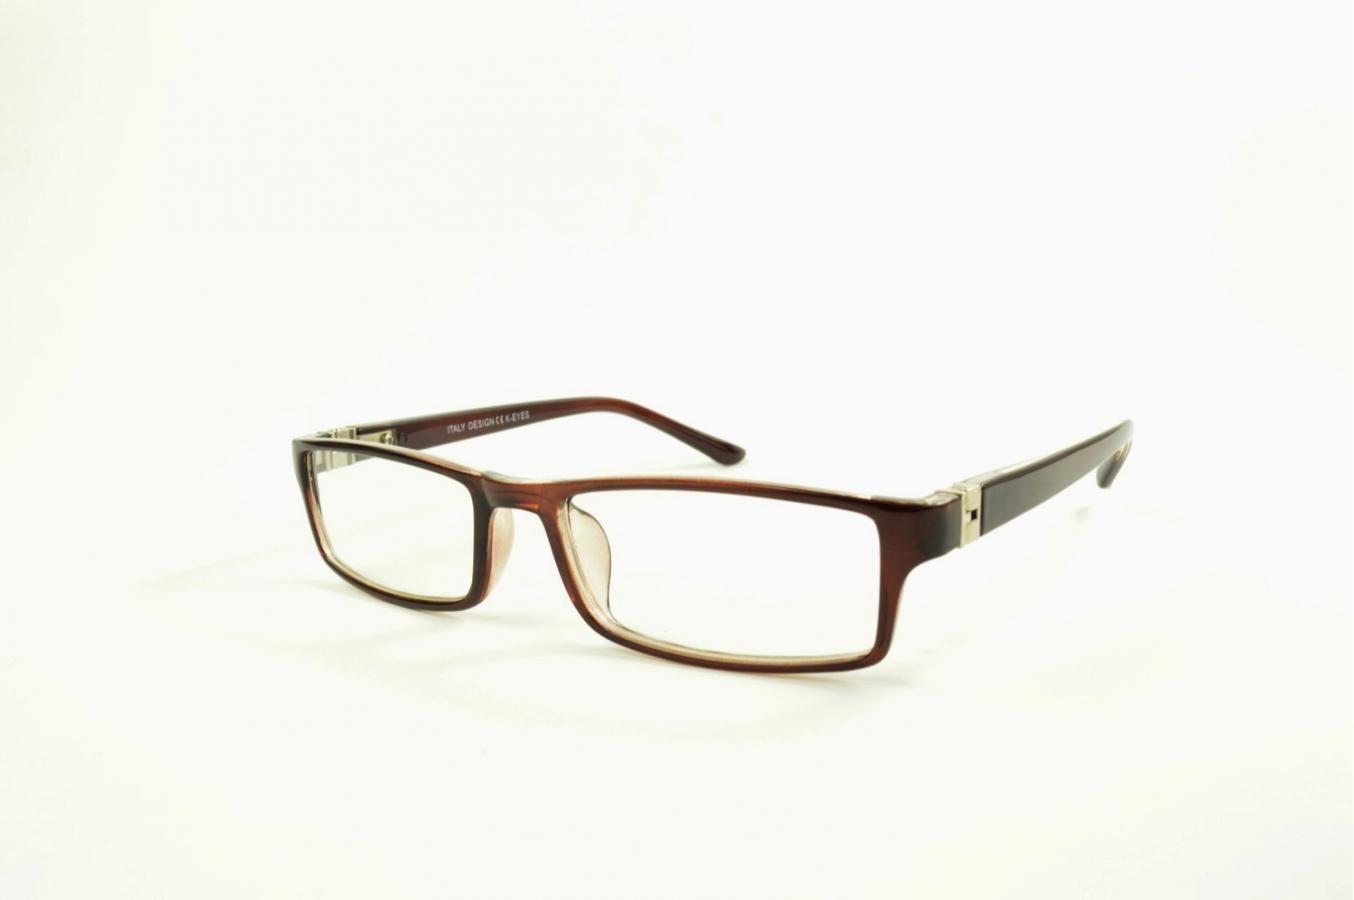 Rectangular sun reading glasses with rounded edges - K-EYES